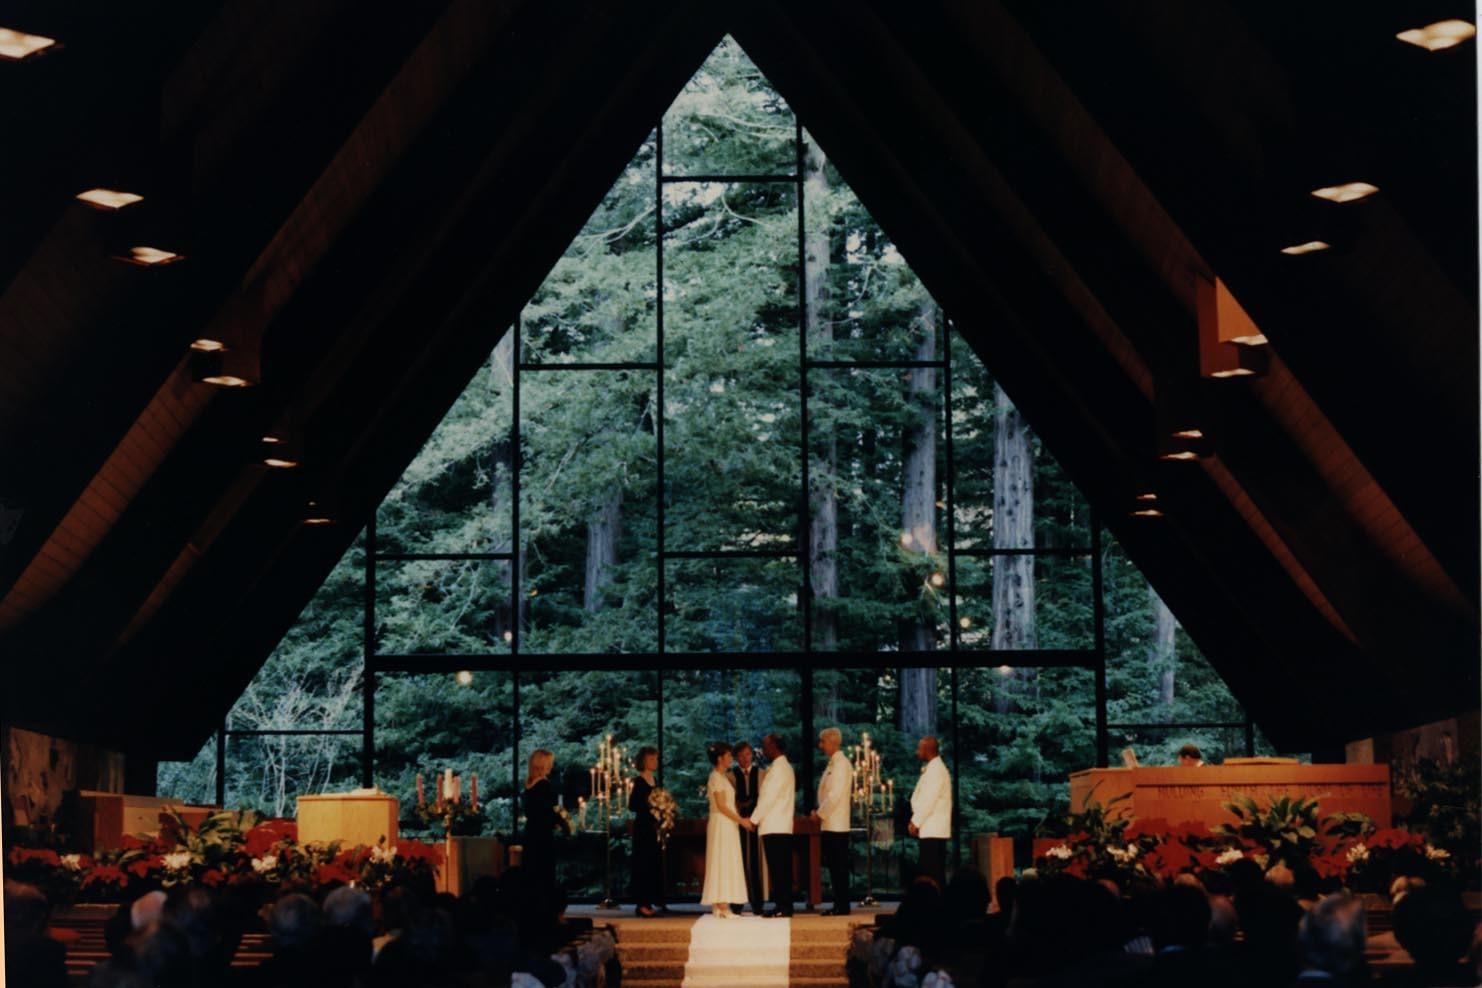 Valley presbyterian church